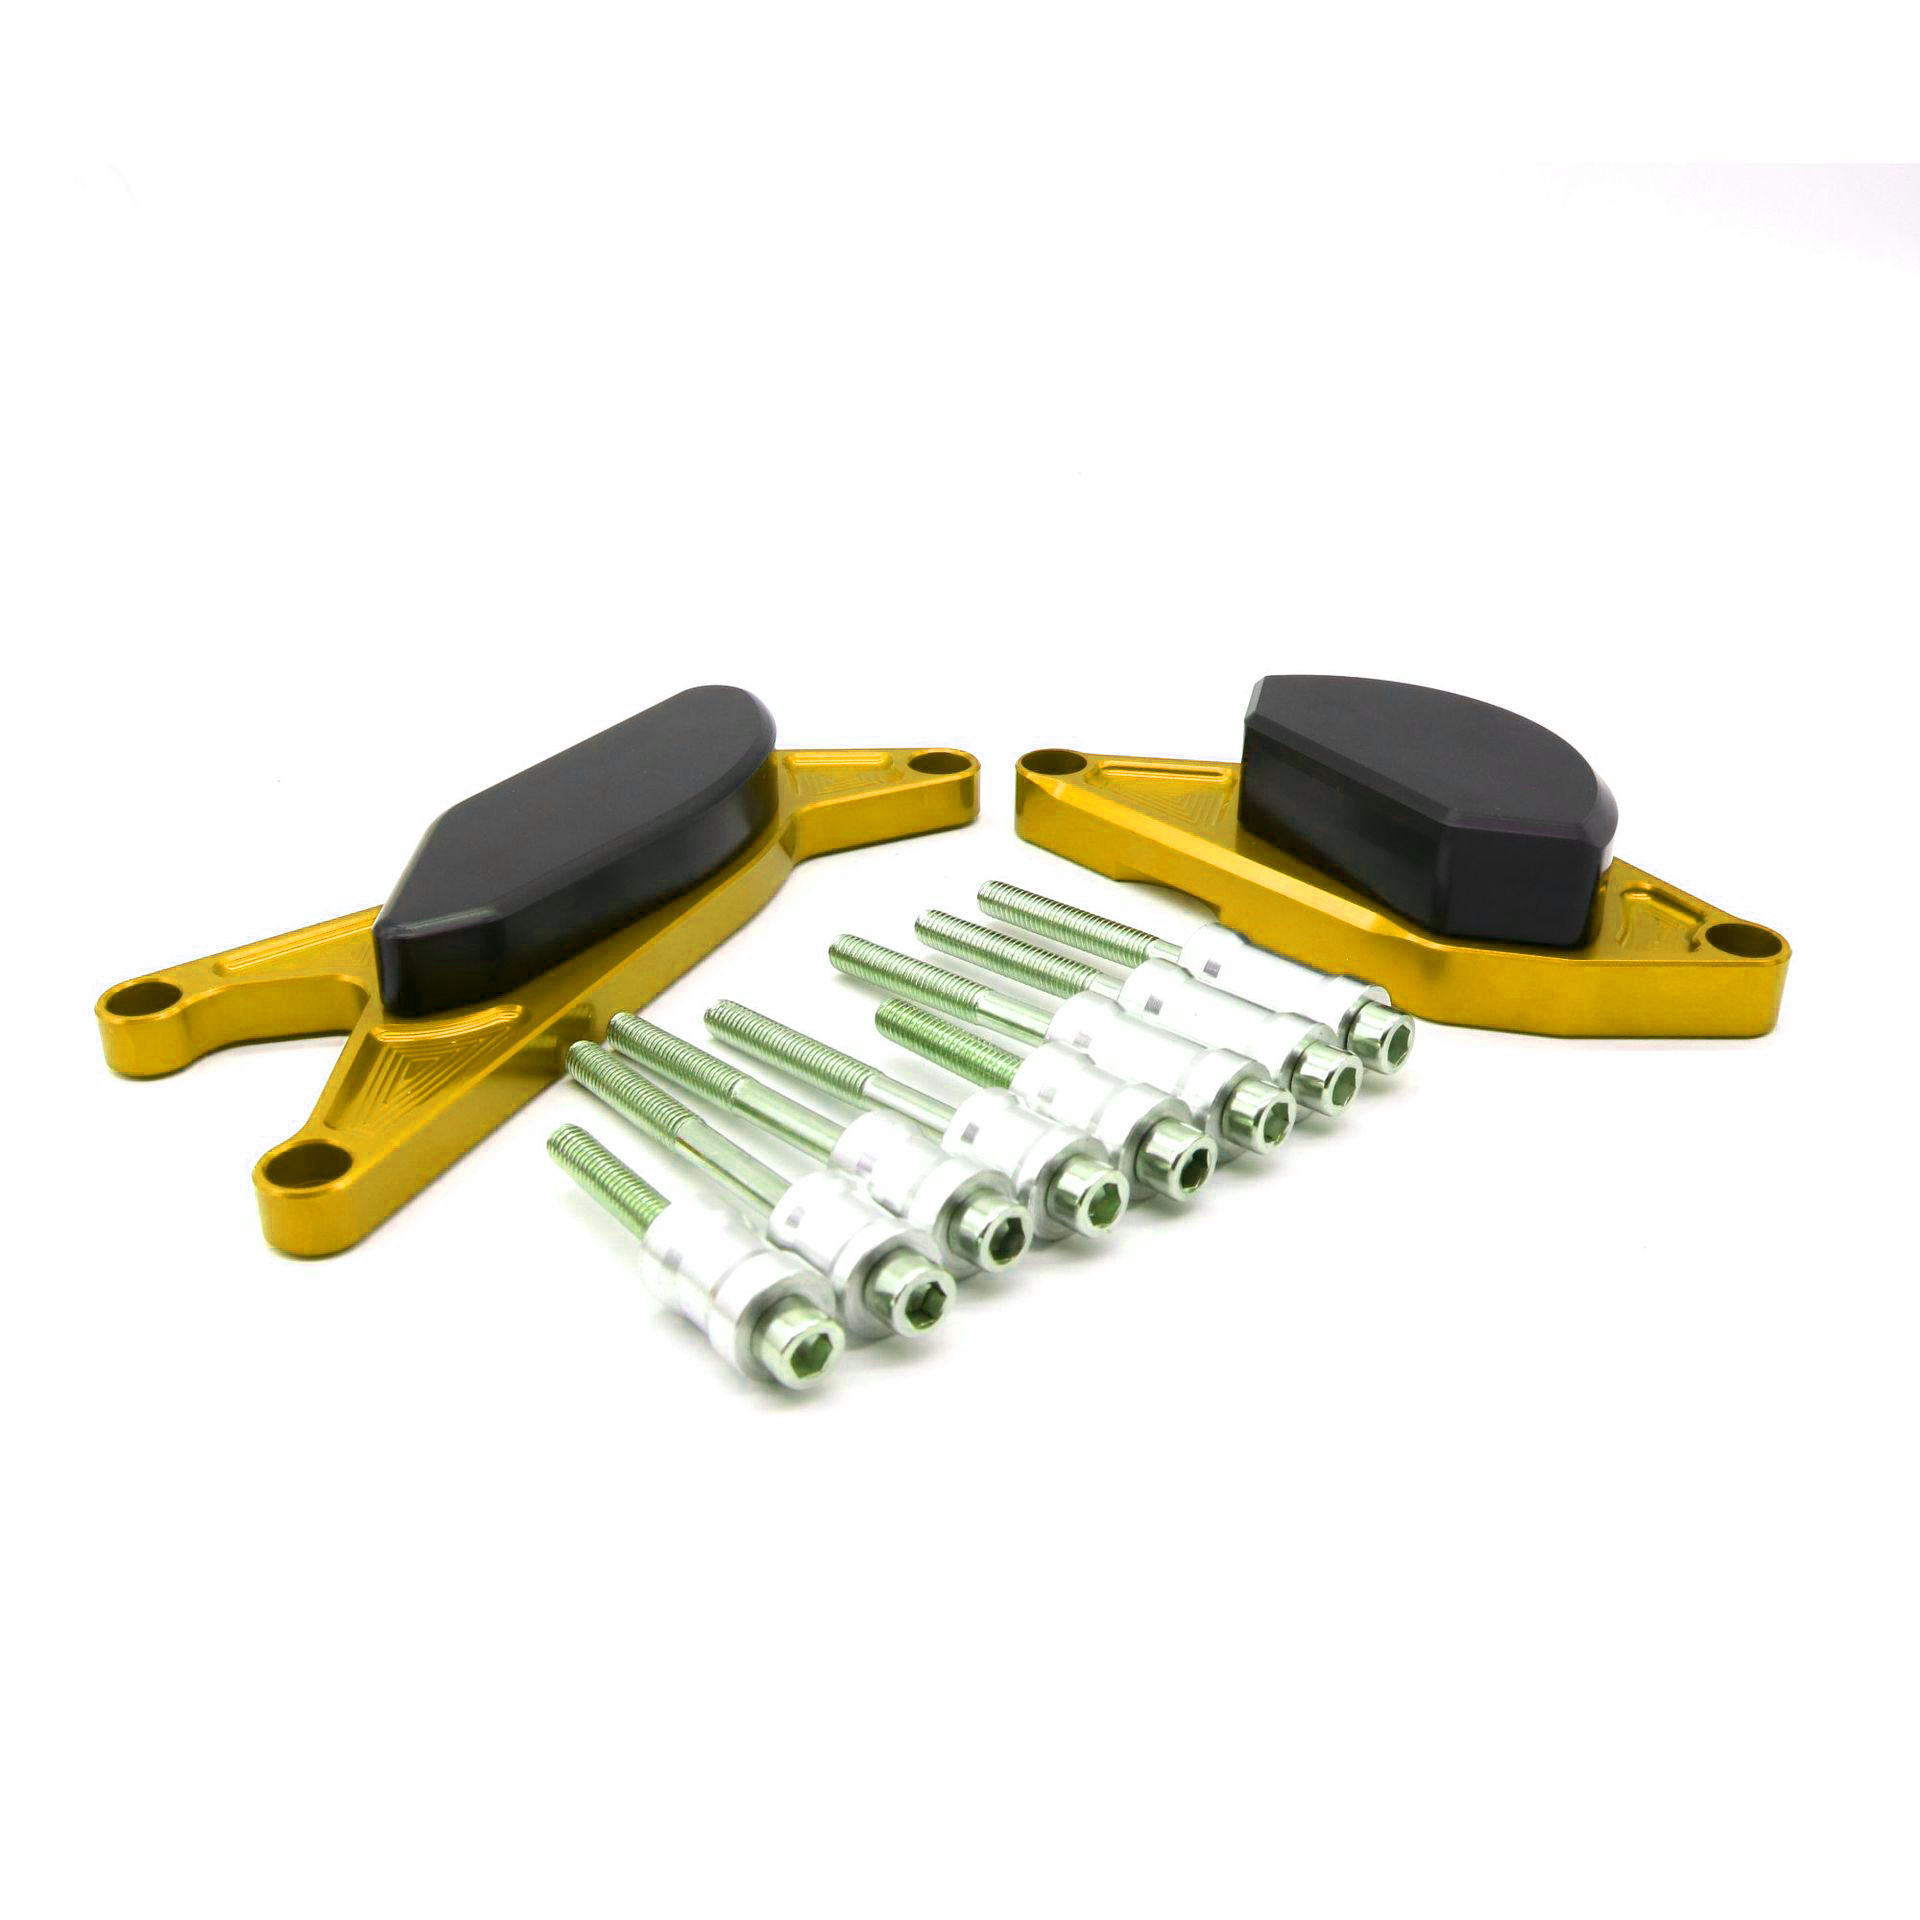 Motorcycle Frame Slider Crash Pad Cover Falling Protector Engine Stator Guard for Suzuki GSXR1000 GSX-S1000/F GSR400/600 gold